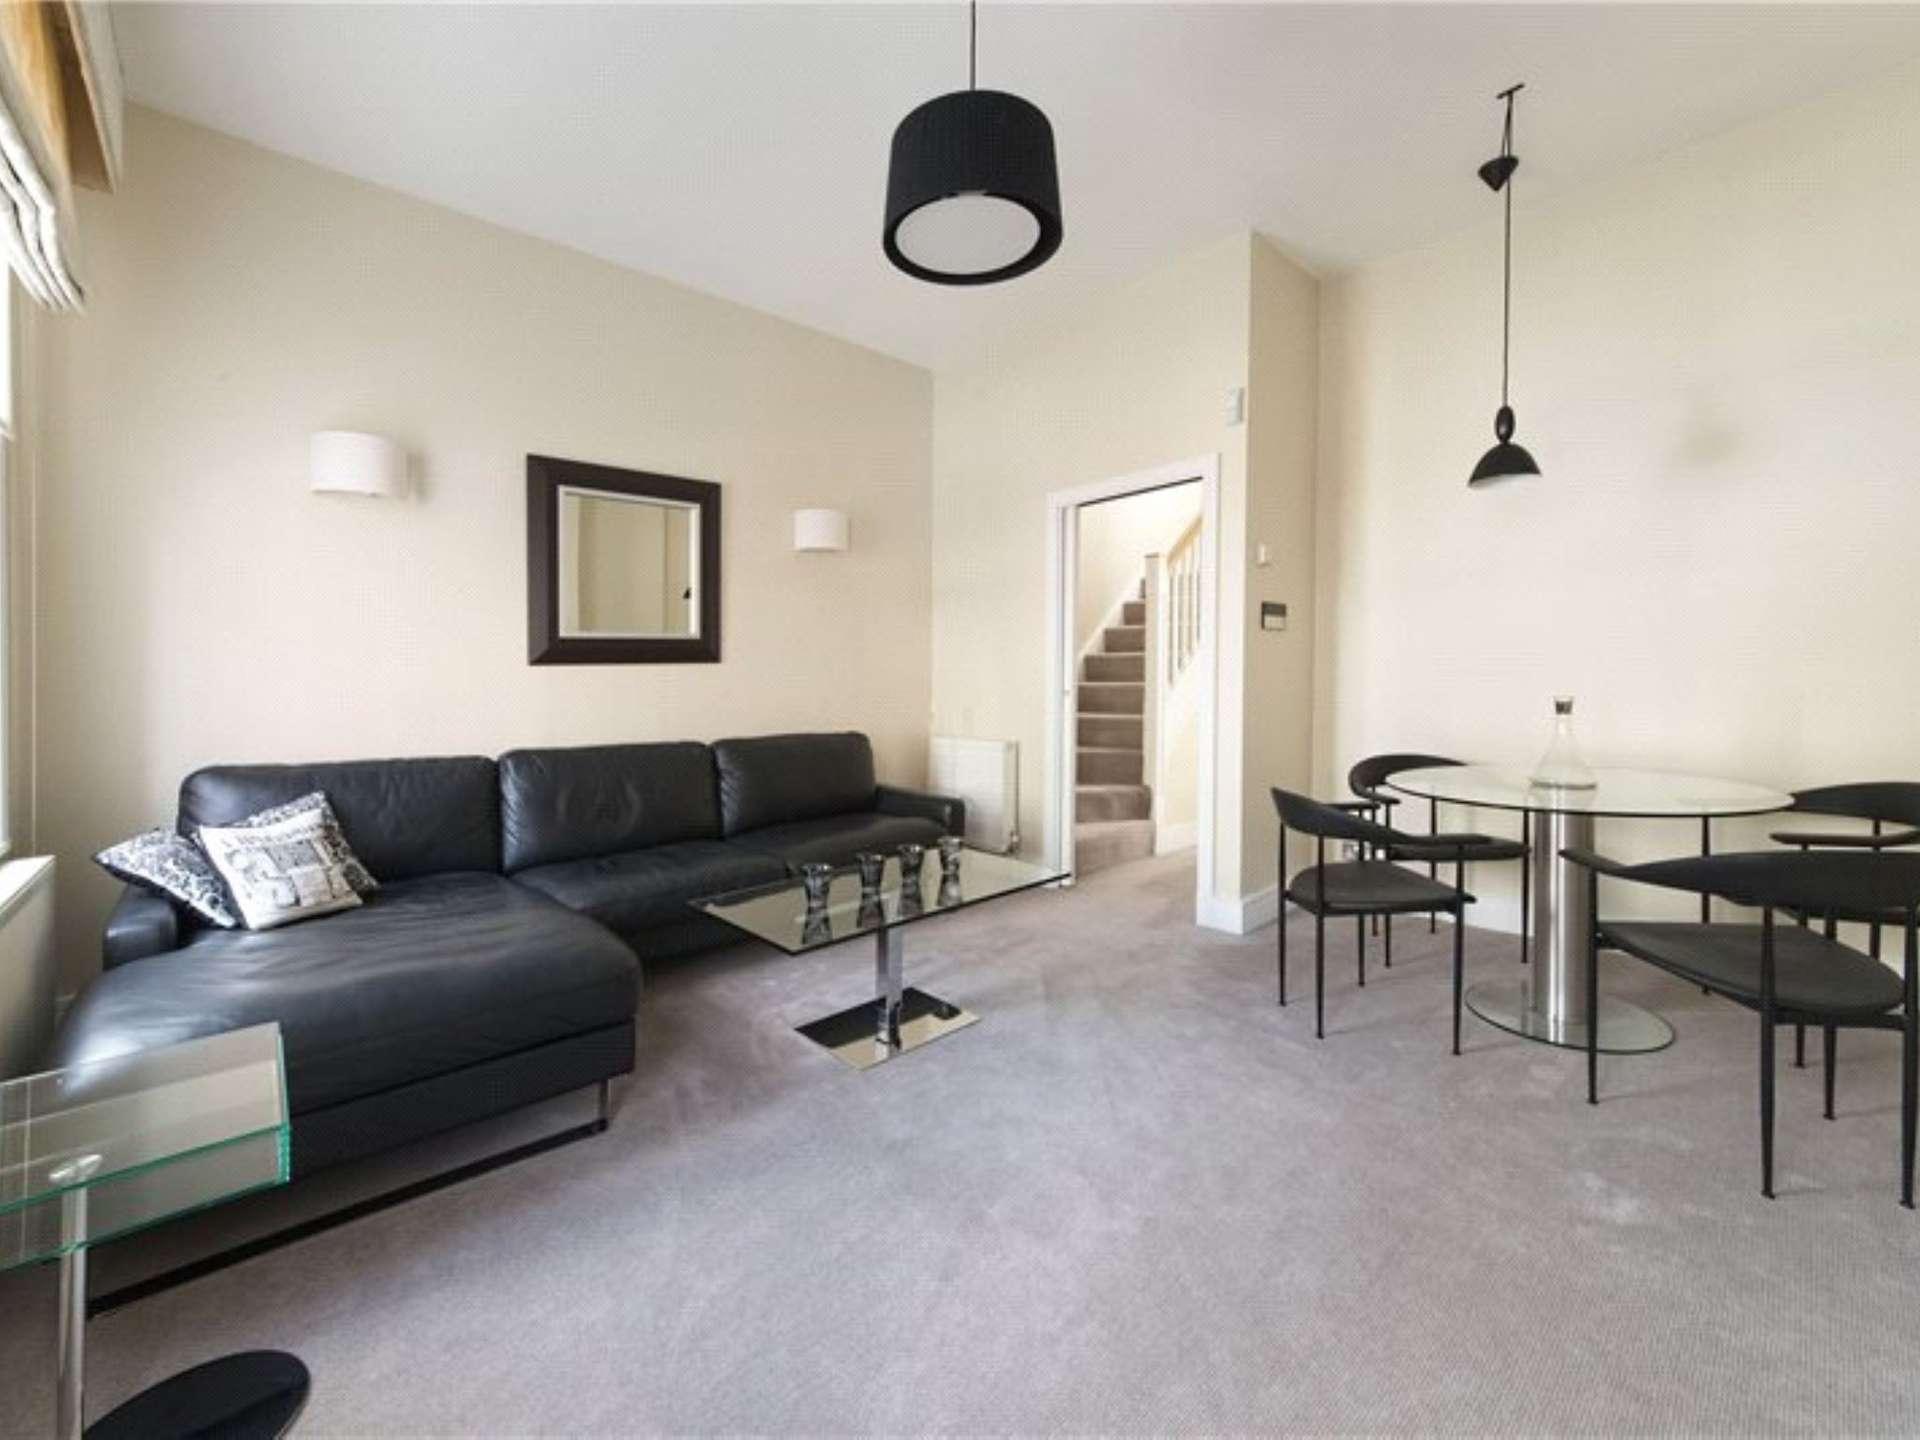 Savills - Cheval Place, Knightsbridge, London, Sw7 1Ew - Property